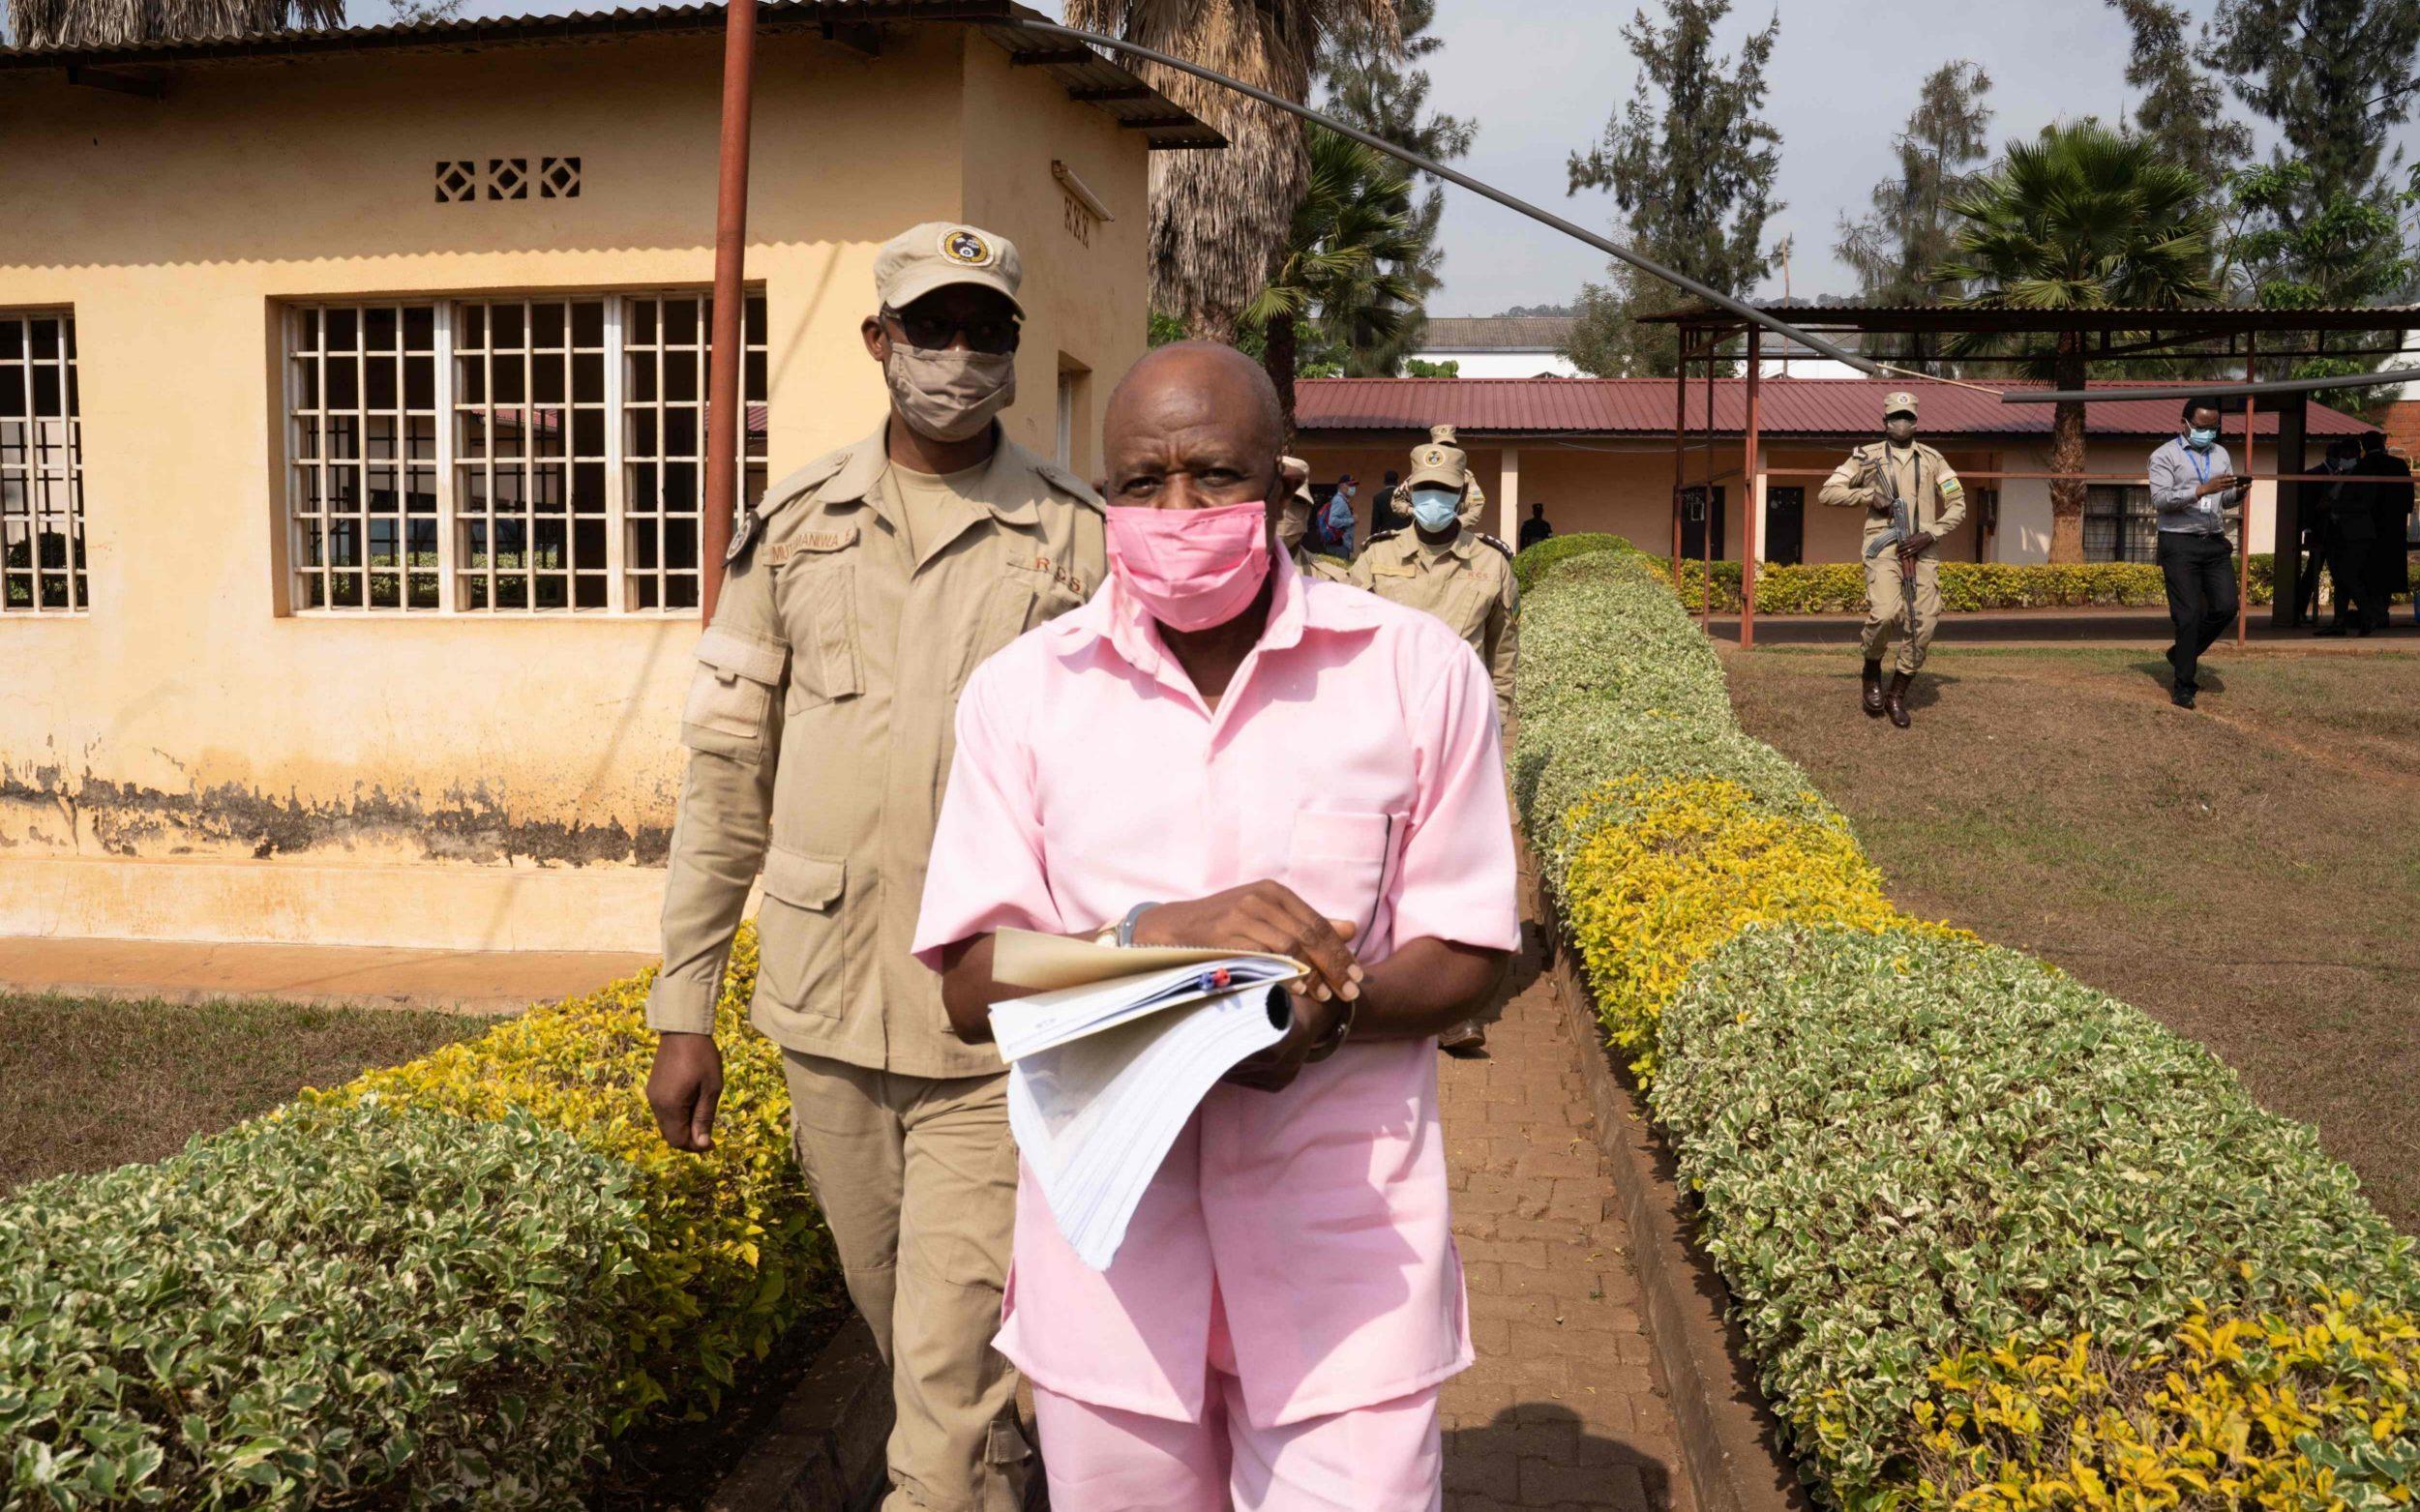 Hotel Rwanda hero admits forming armed group behind deadly attacks